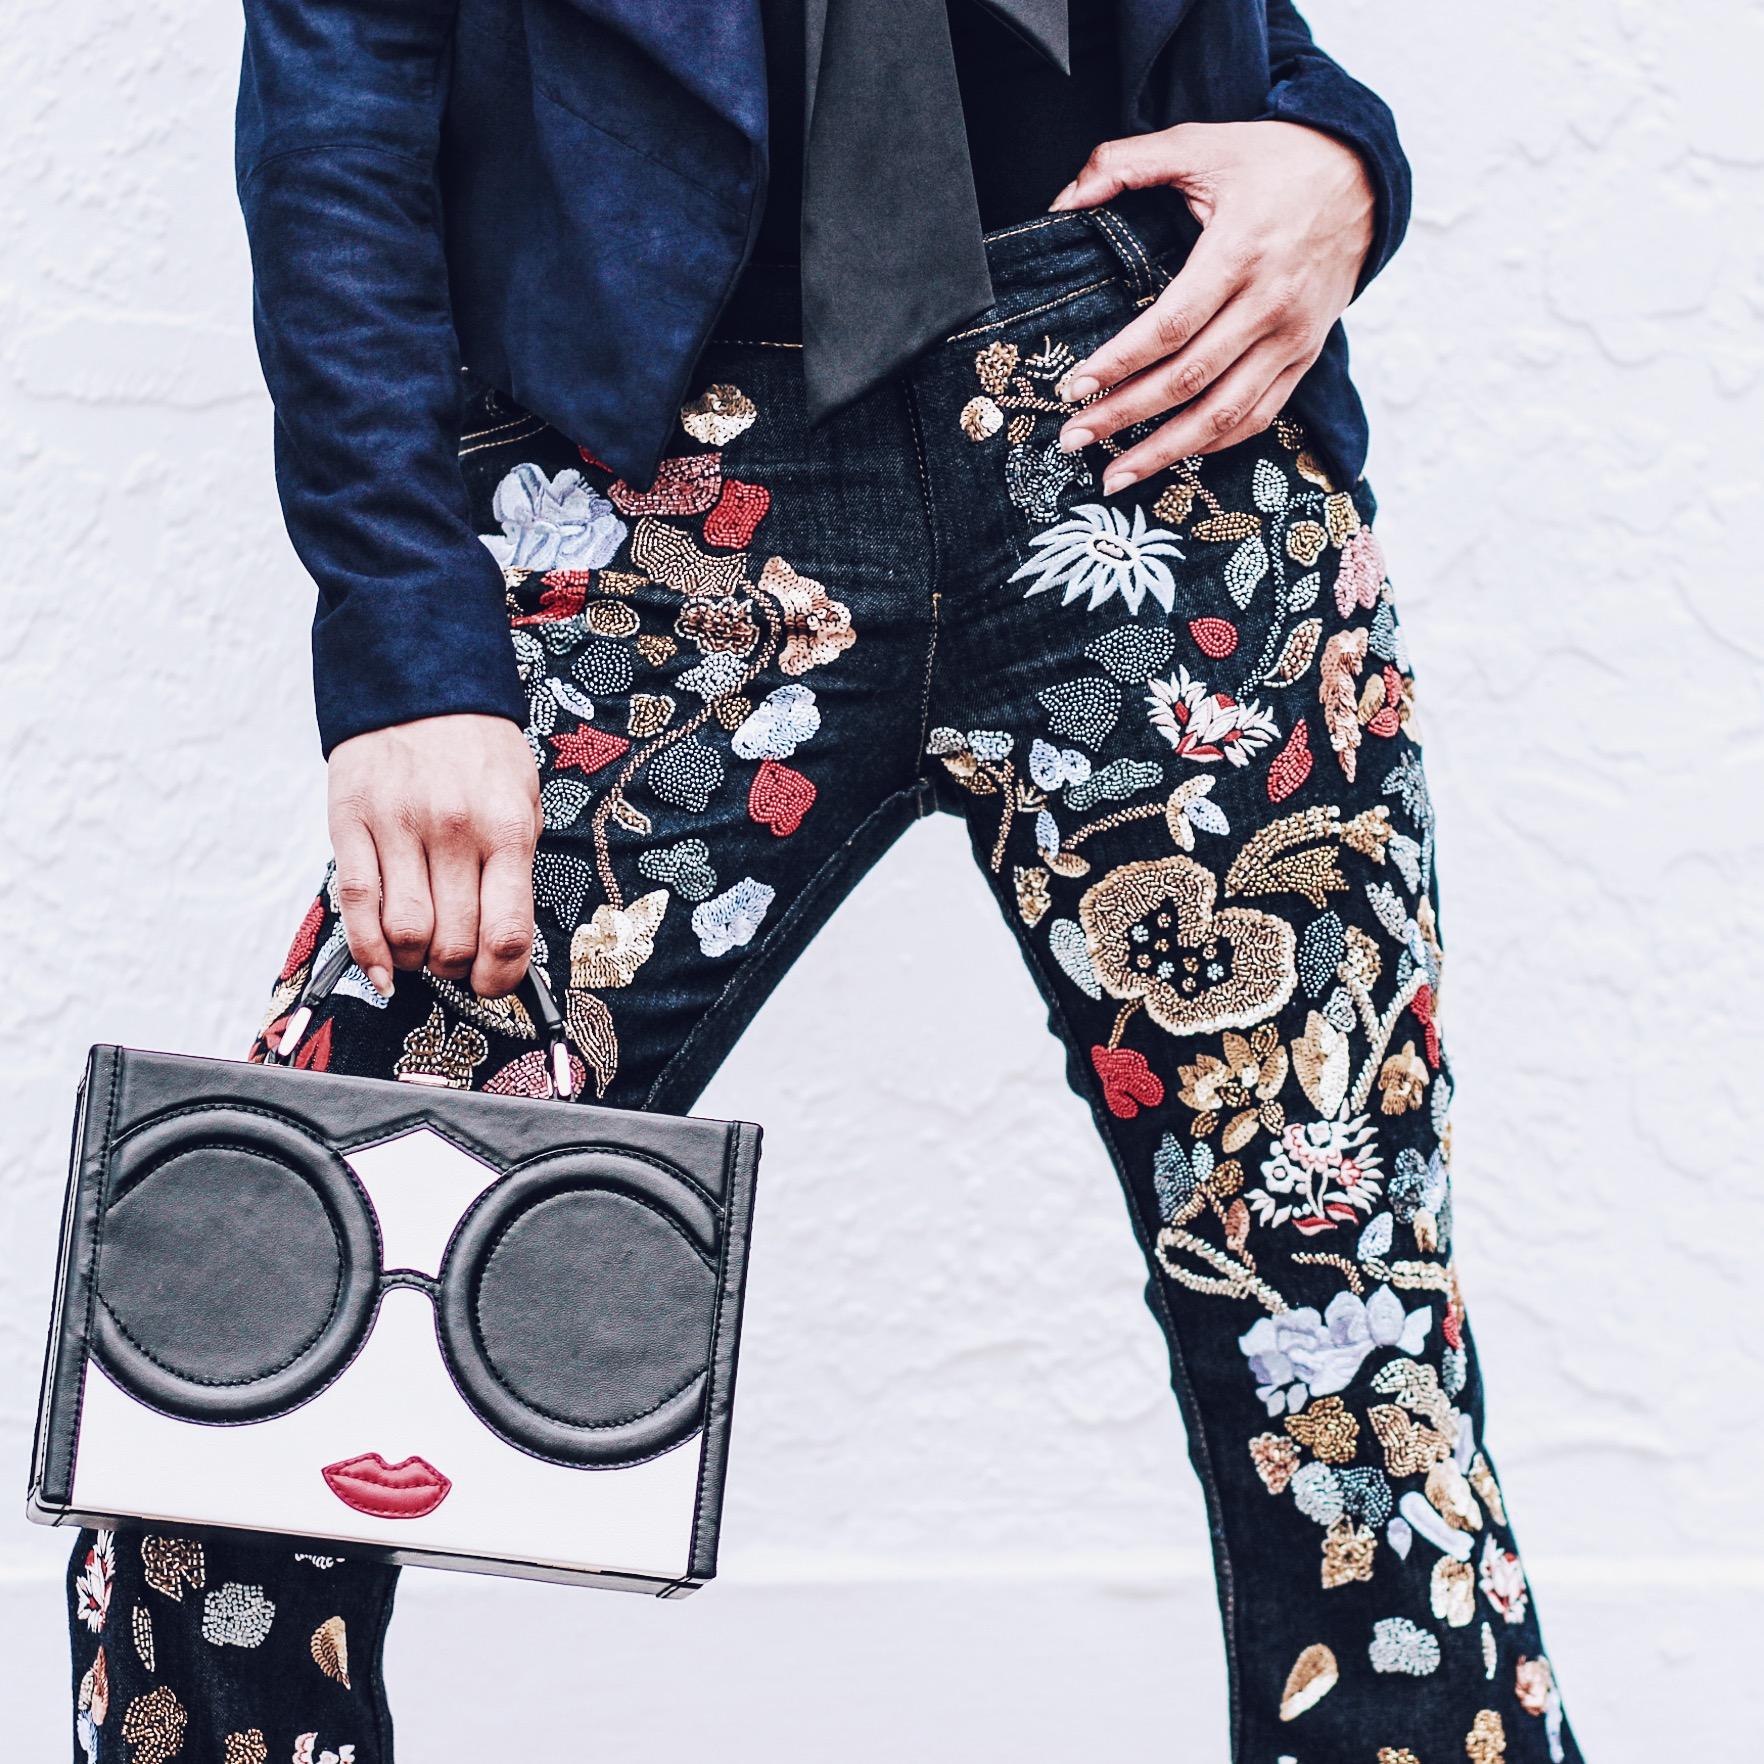 miami-fashion-stylist-portfolio-blogger-illy-perez-house-of-she21.JPG